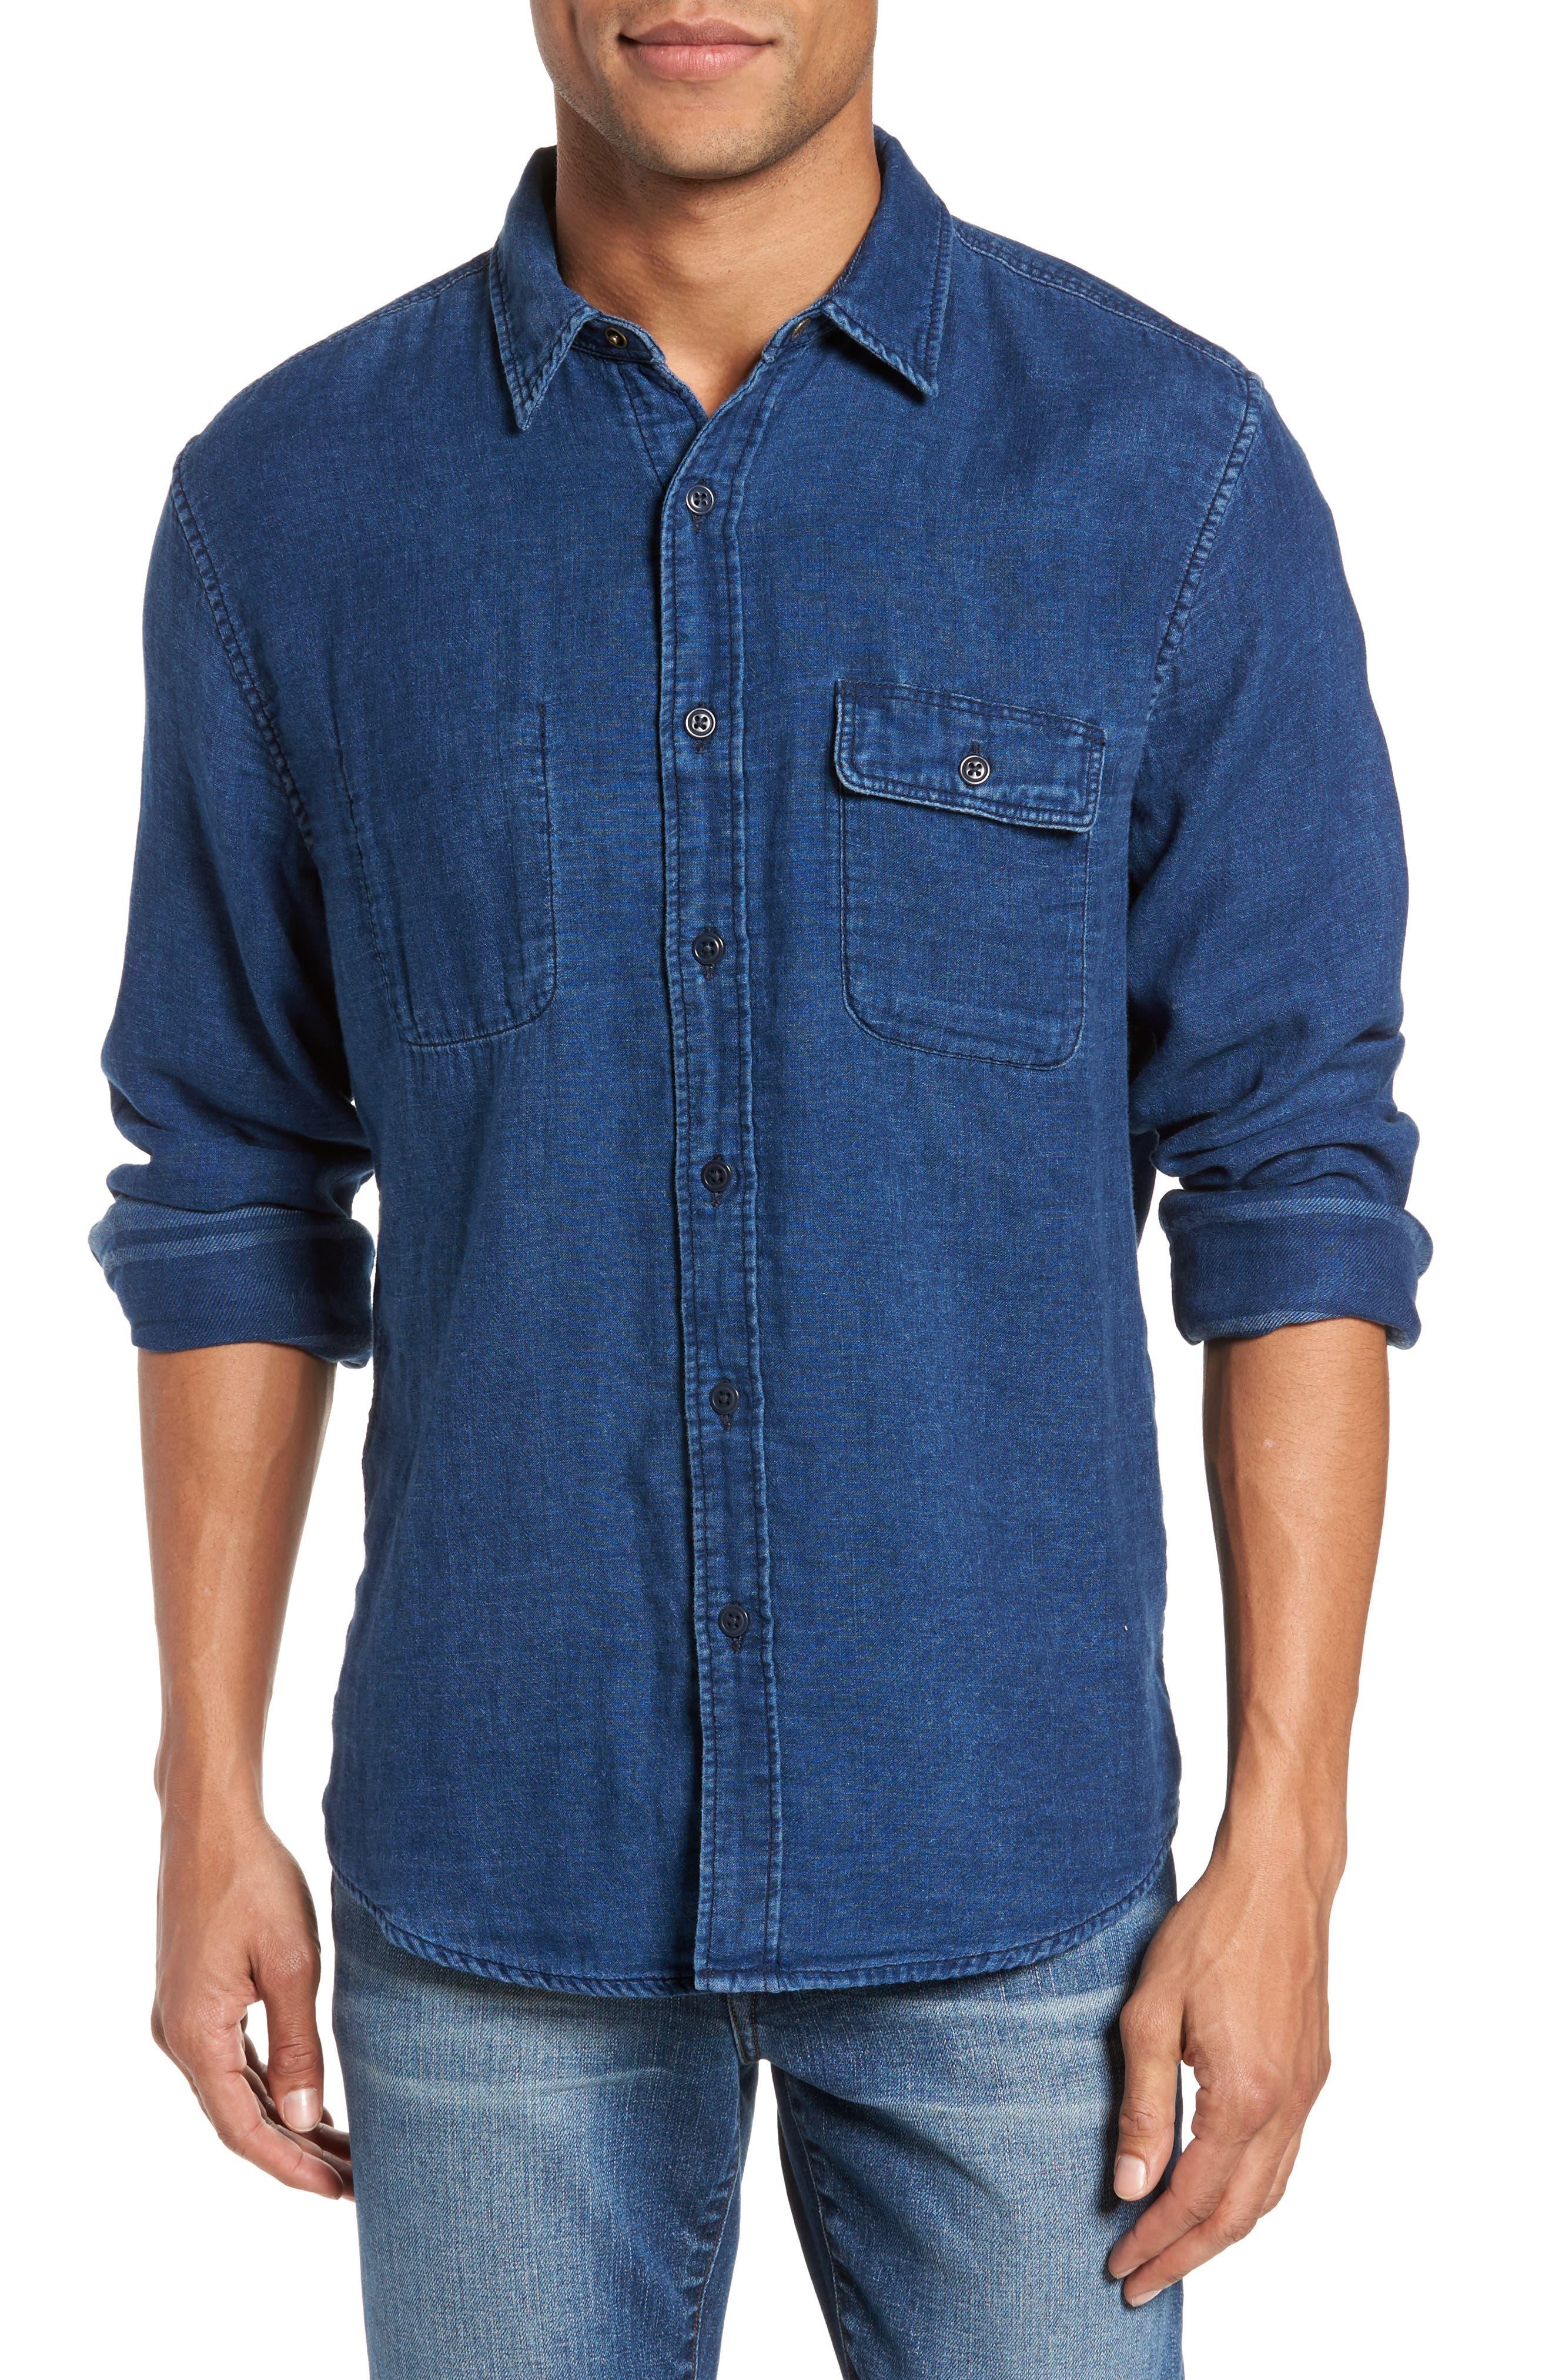 Main Image - Faherty Brand Belmar Reversible Work Shirt